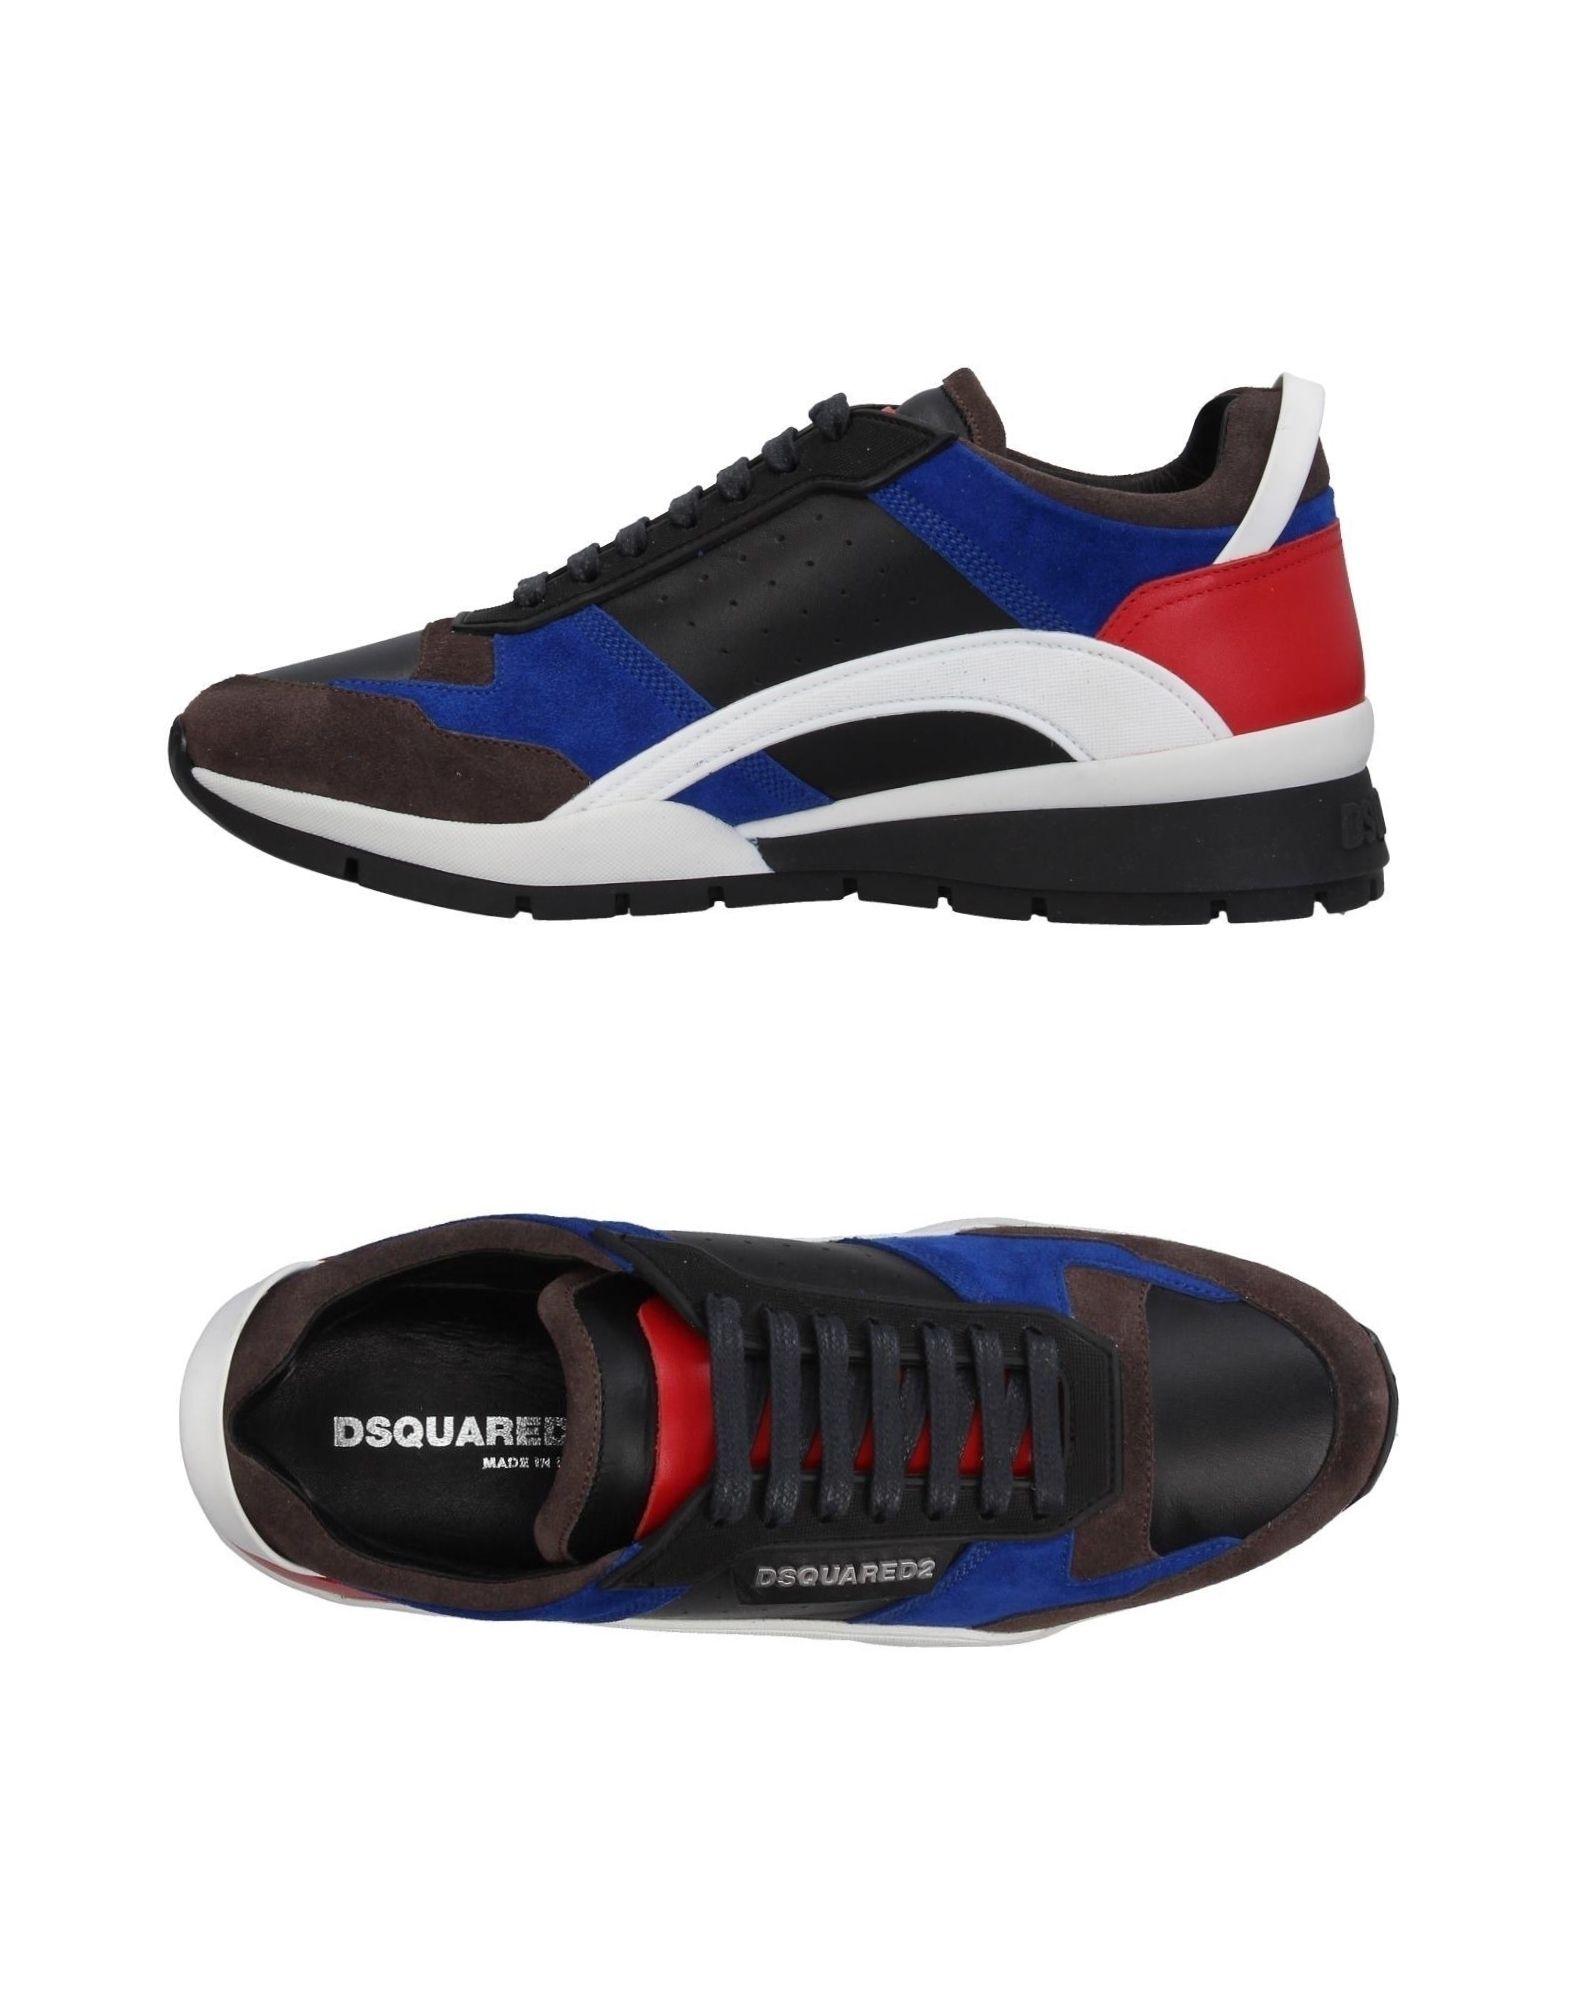 Dsquared2 Sneakers - Men Dsquared2 Sneakers online on 11399362GE  United Kingdom - 11399362GE on da65de